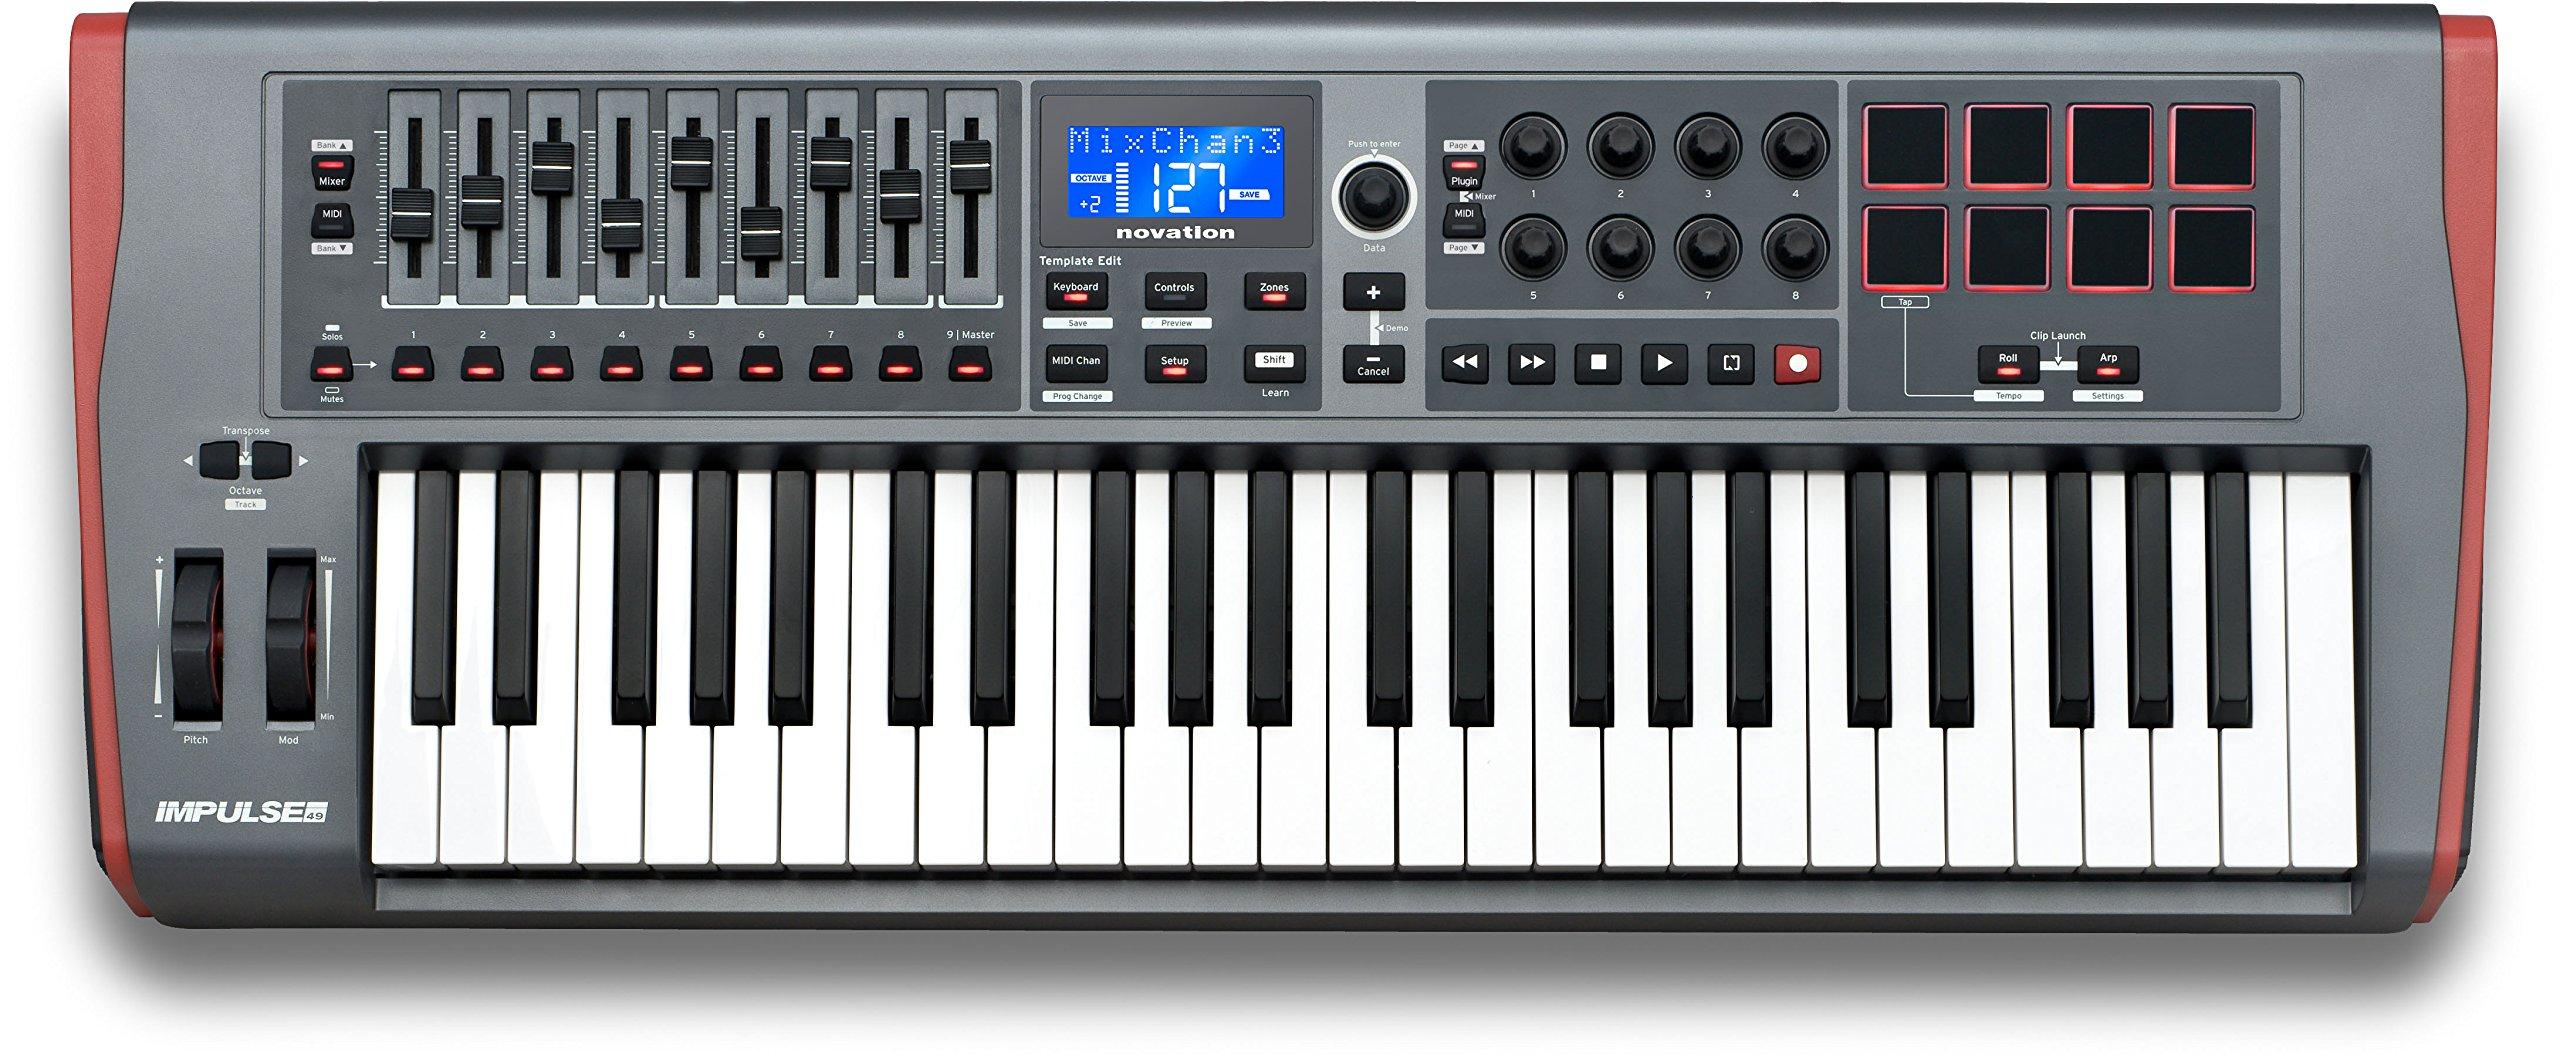 Novation Impulse 49 Keyboard Bundle with MIDI Cables and Austin Bazaar Polishing Cloth by Novation (Image #2)